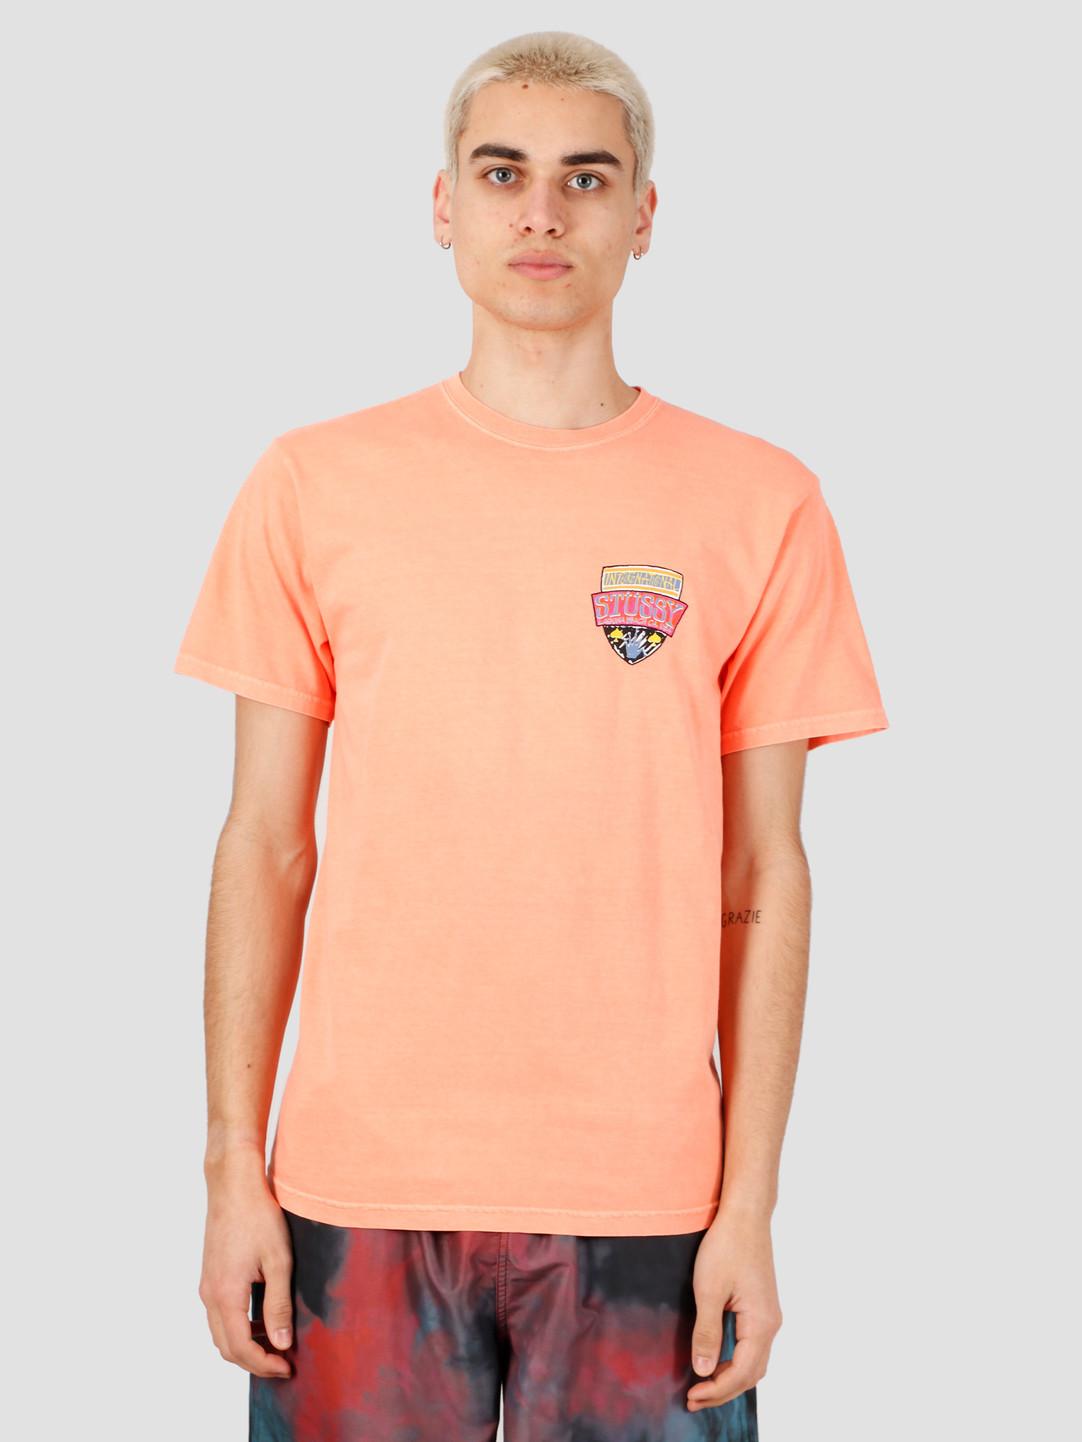 Stussy Stussy Association Pig. Dyed Tee Neon Orange 1904520